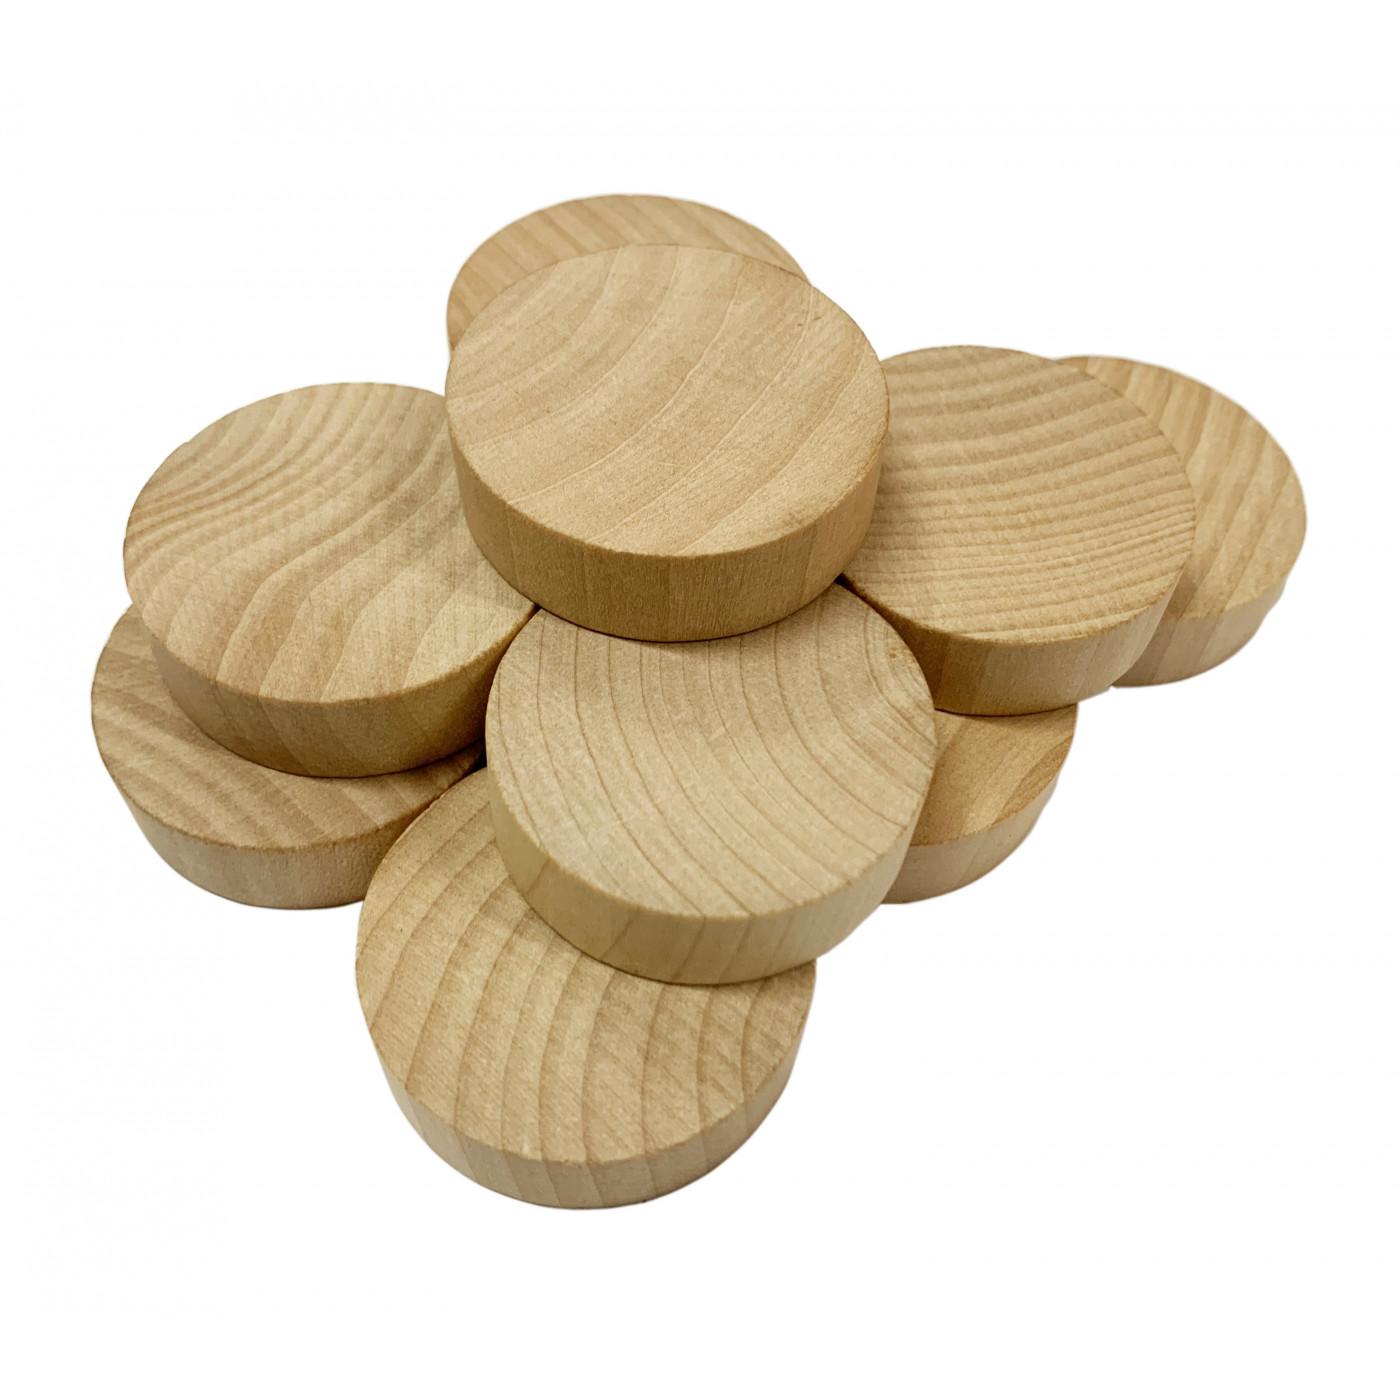 Set of 100 wooden discs (dia: 4 cm, thickness: 12 mm, schima